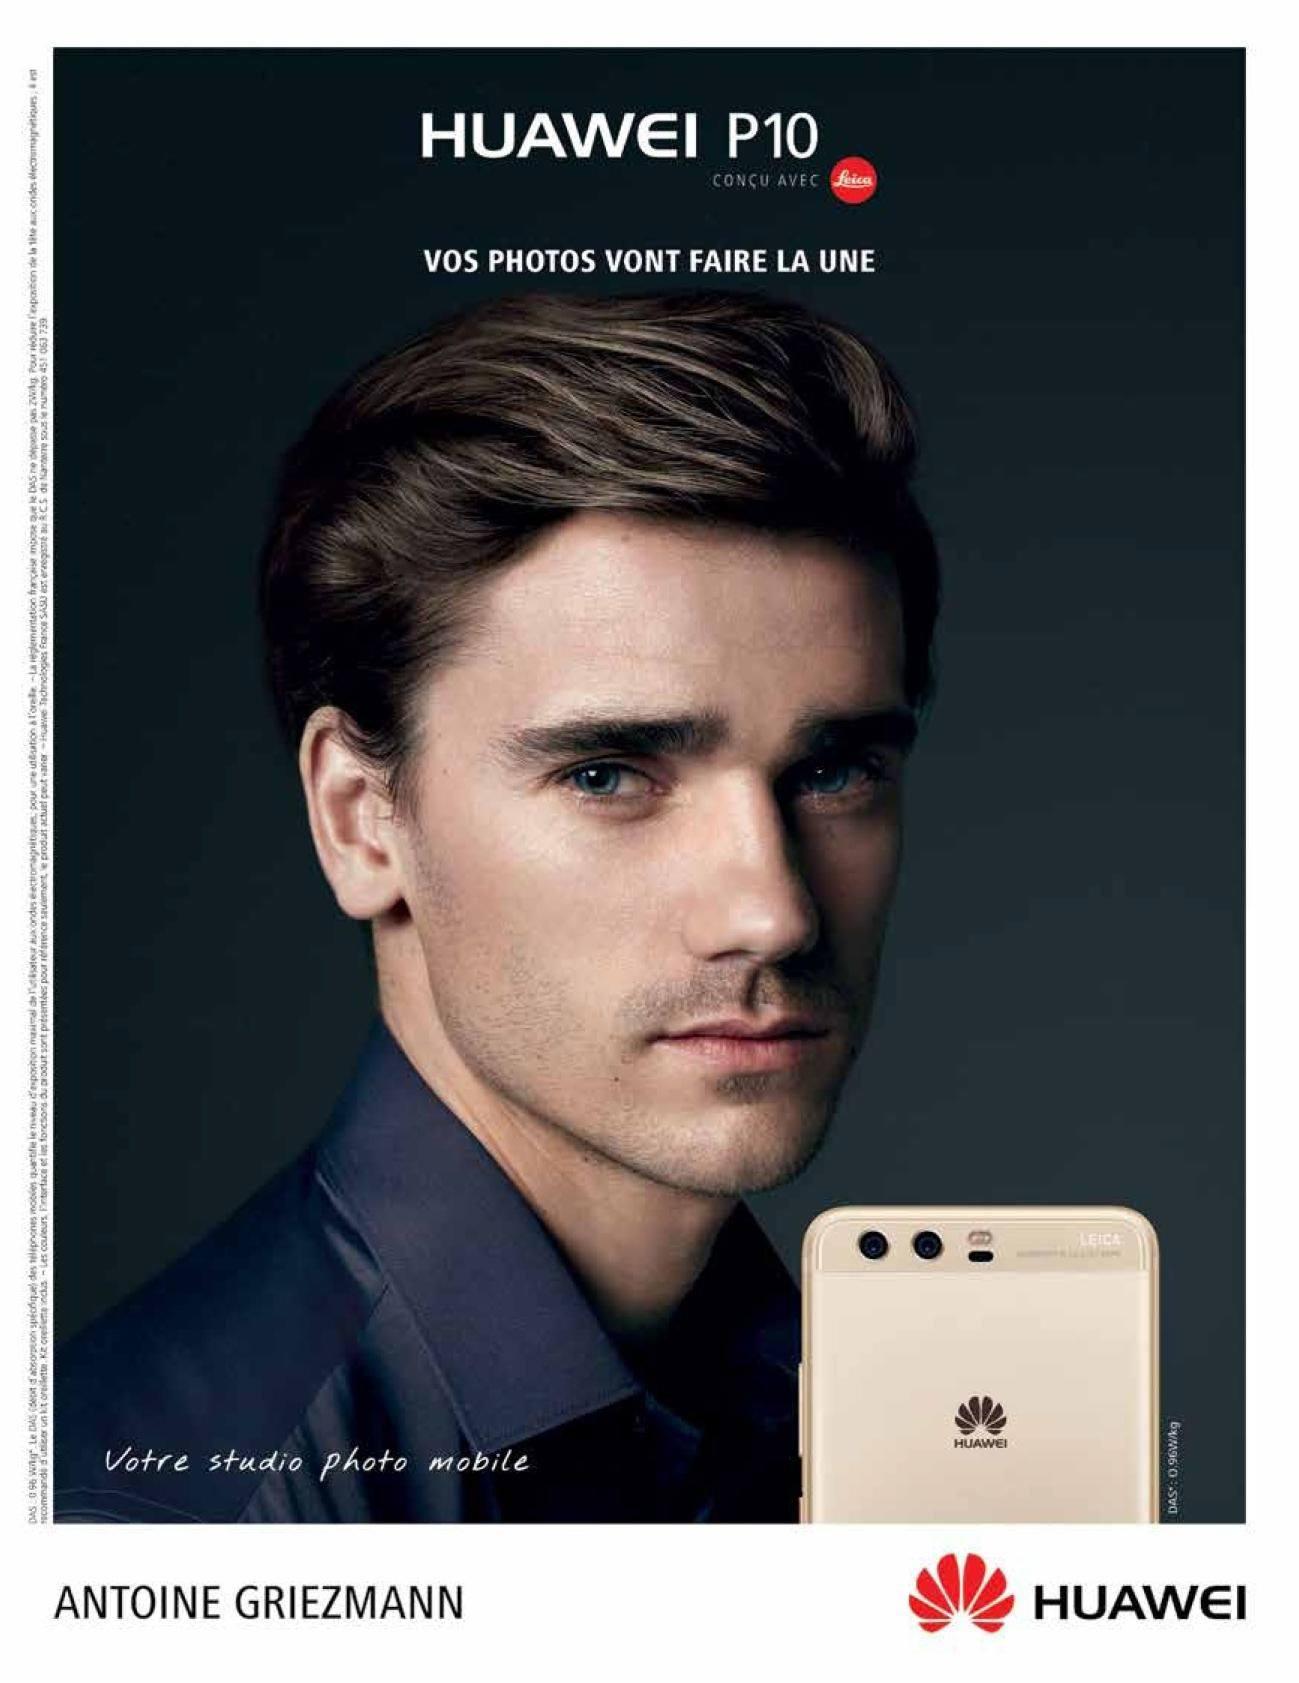 Antoine Griezmann a Huawei P10 francia reklámarca